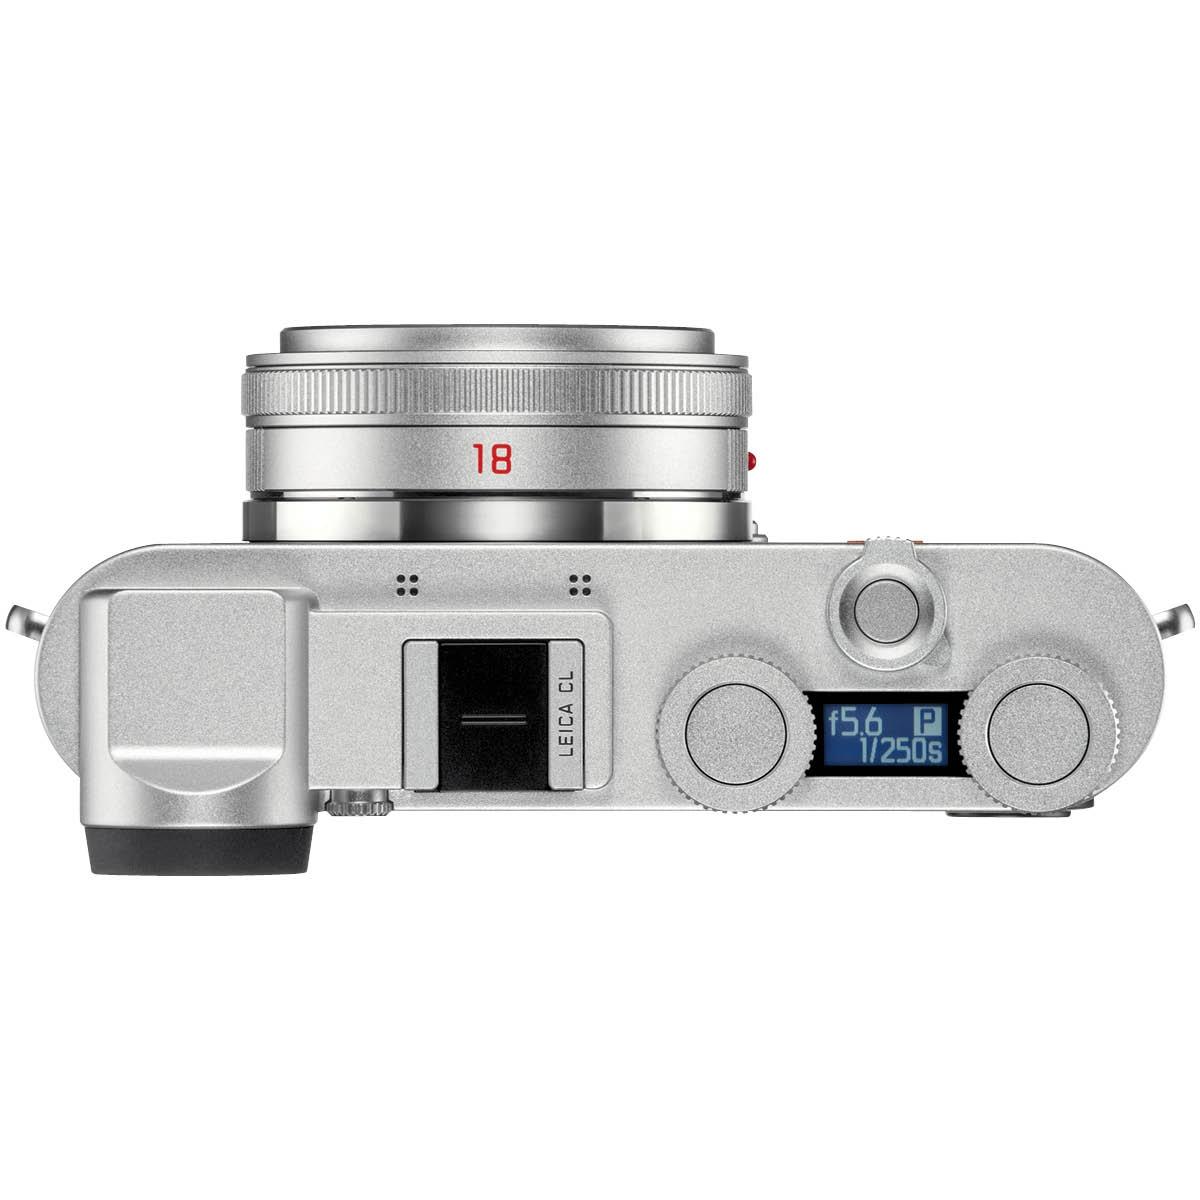 Leica CL Prime Kit mit 18 mm 1:2,8 Silber